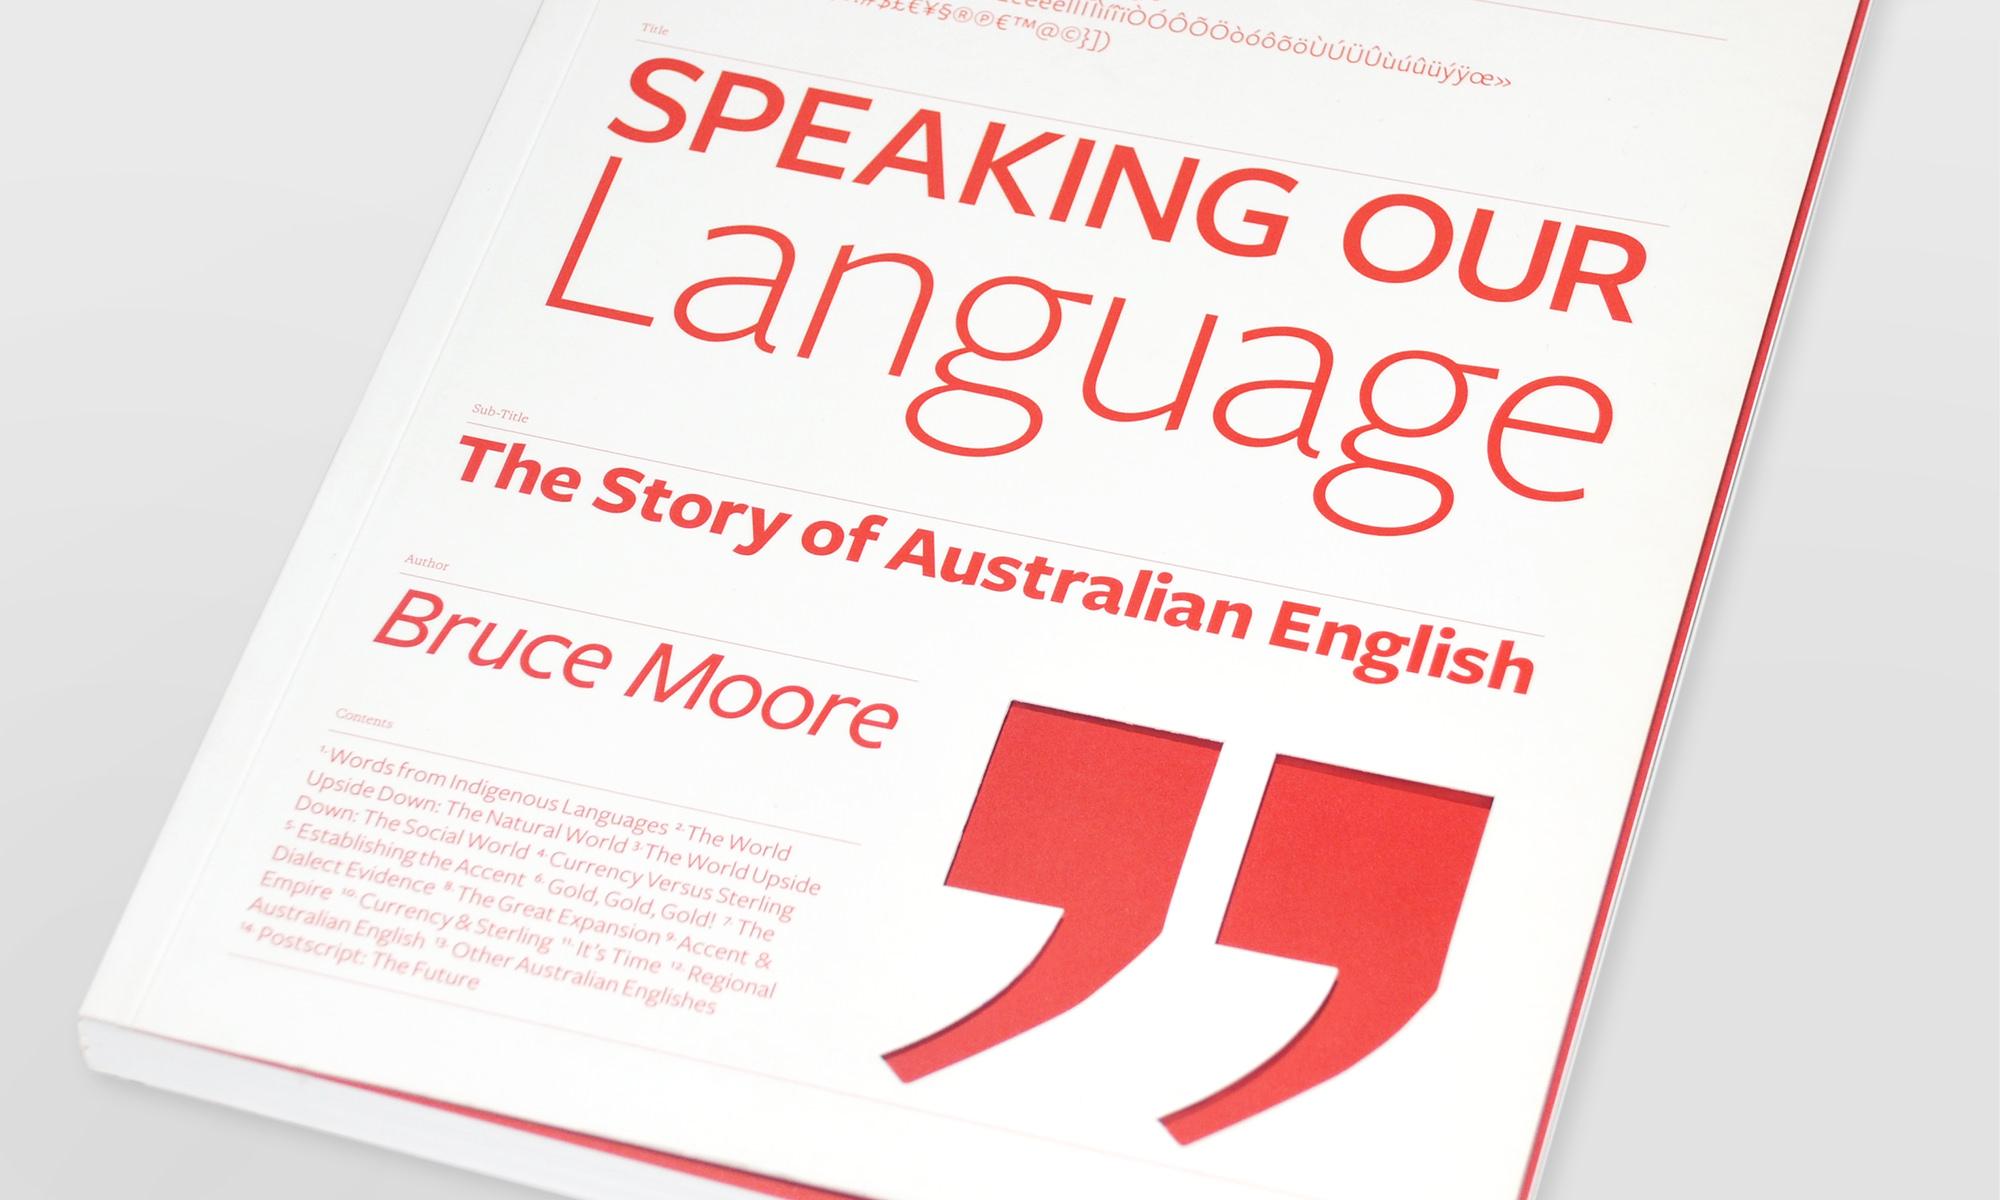 Speaking Our Language